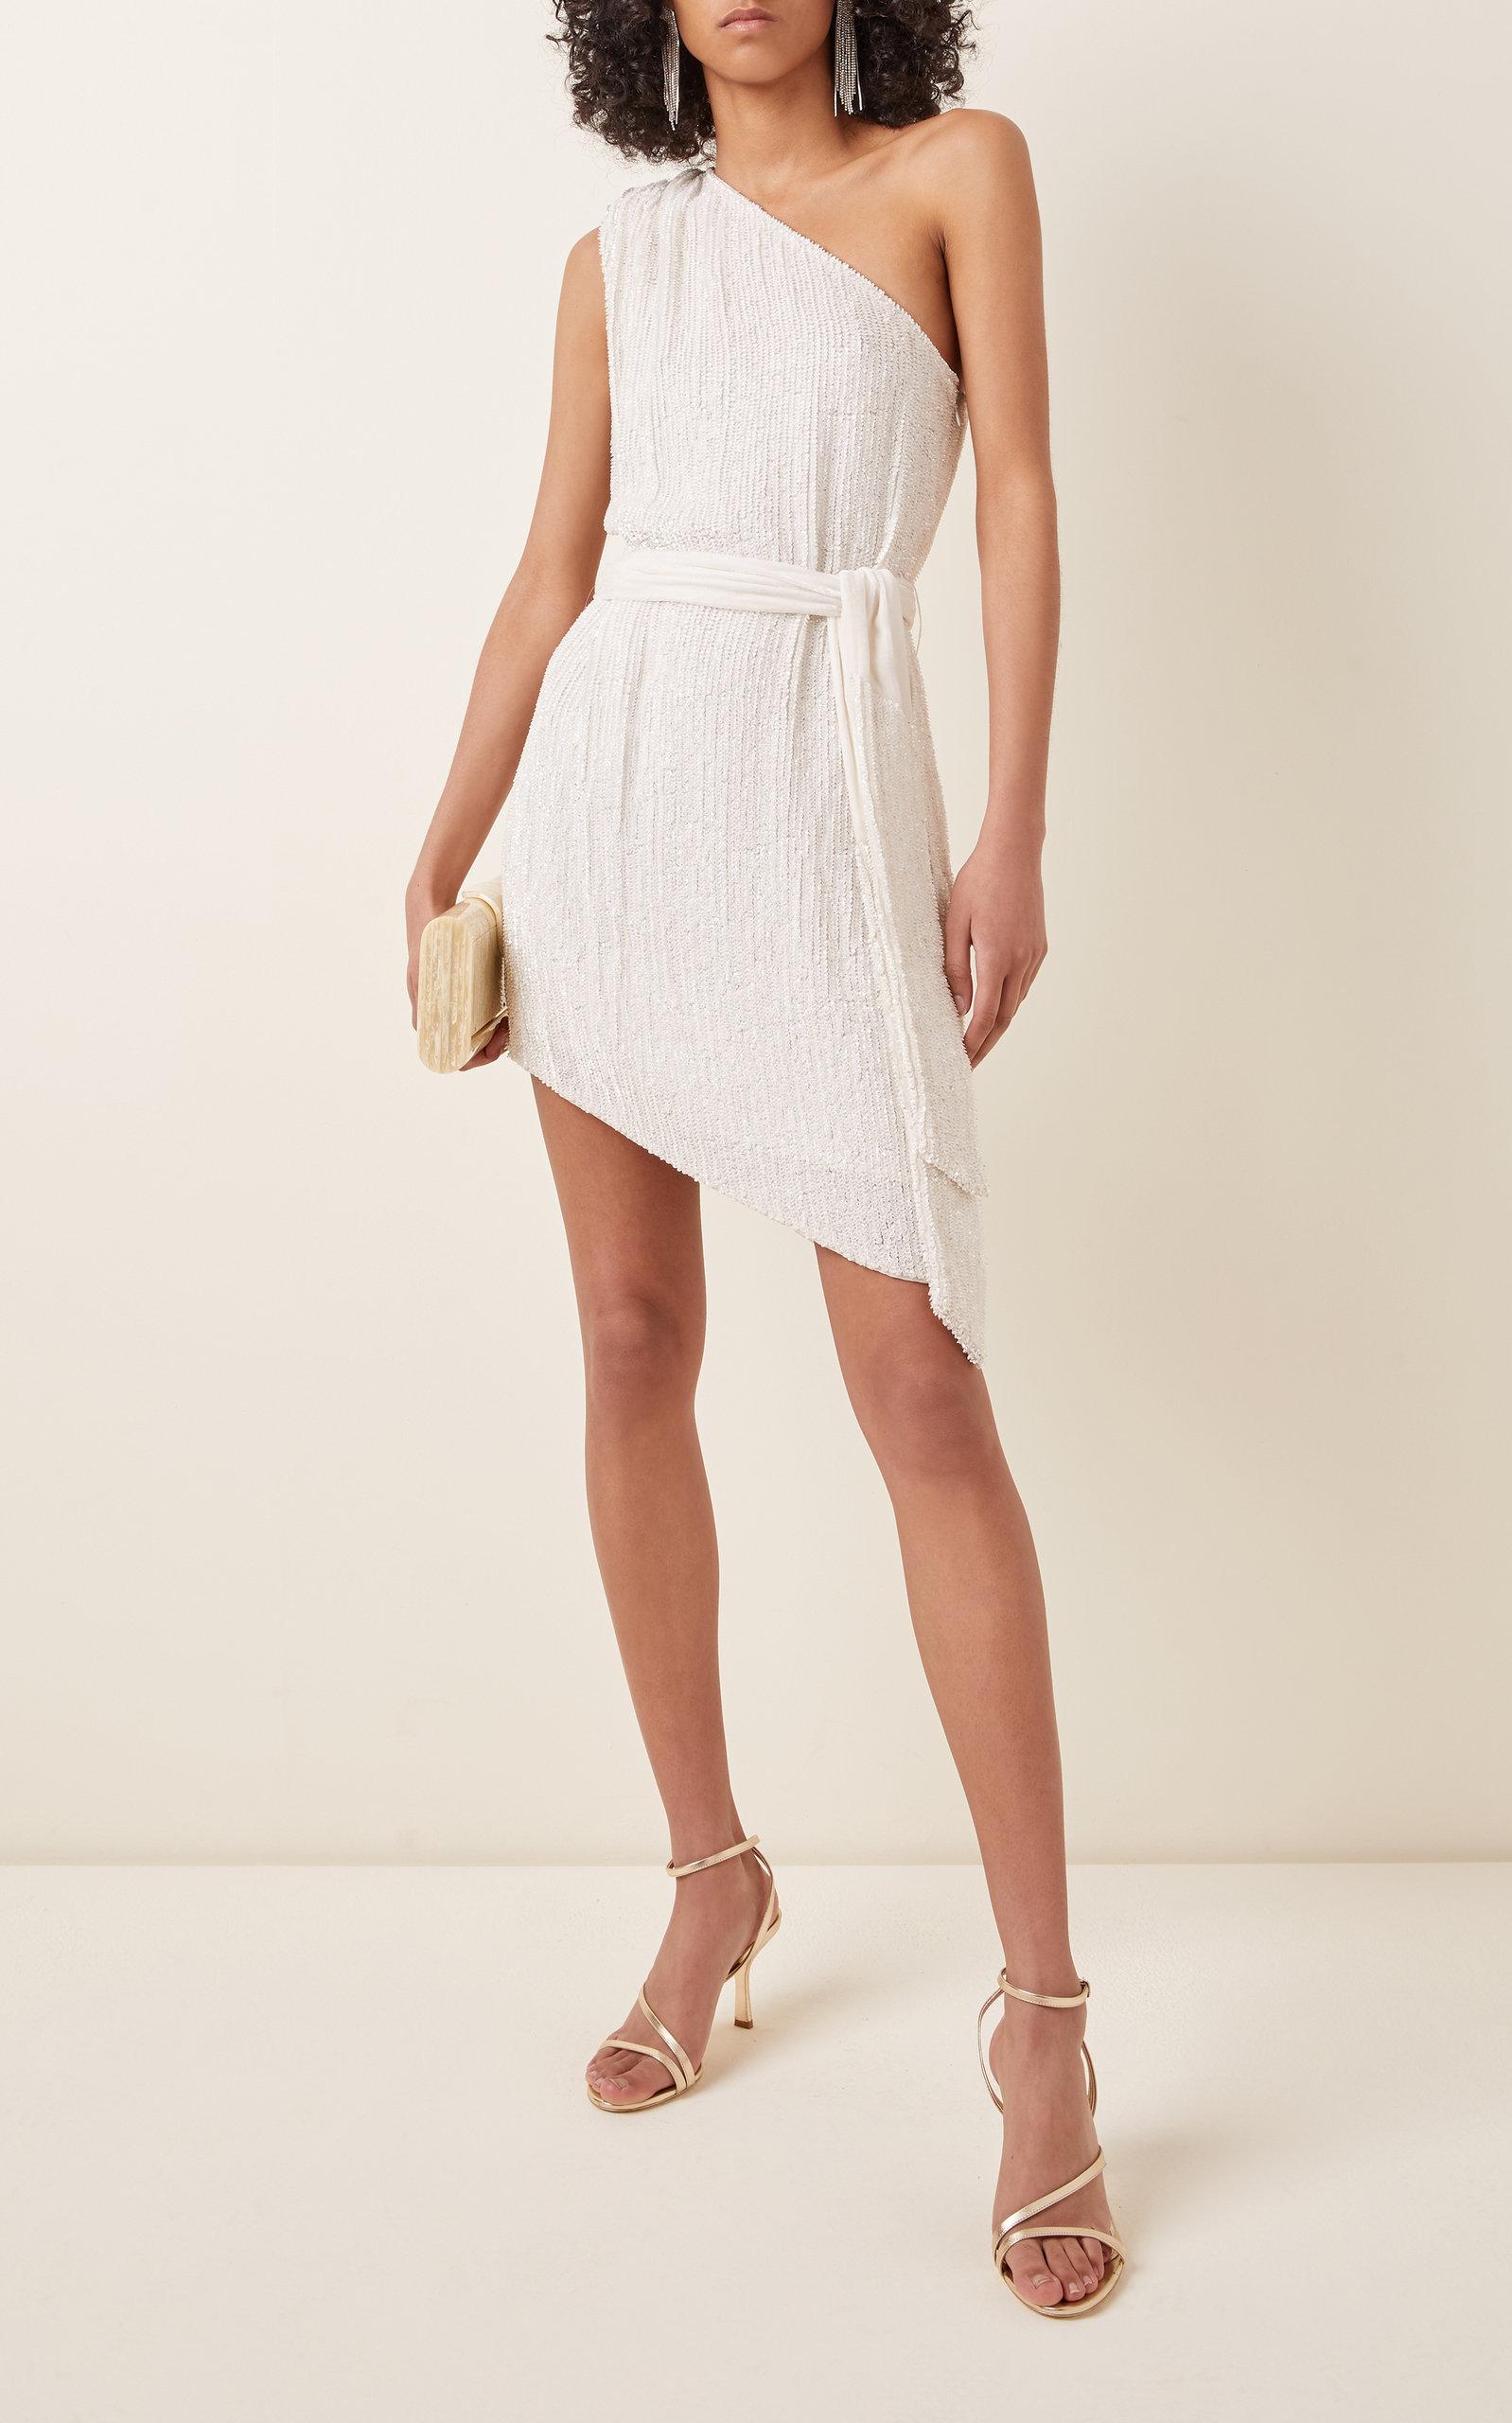 Buy Retrofête Ella Belted Sequined-Chiffon One-Shoulder Mini Dress online, shop Retrofête at the best price